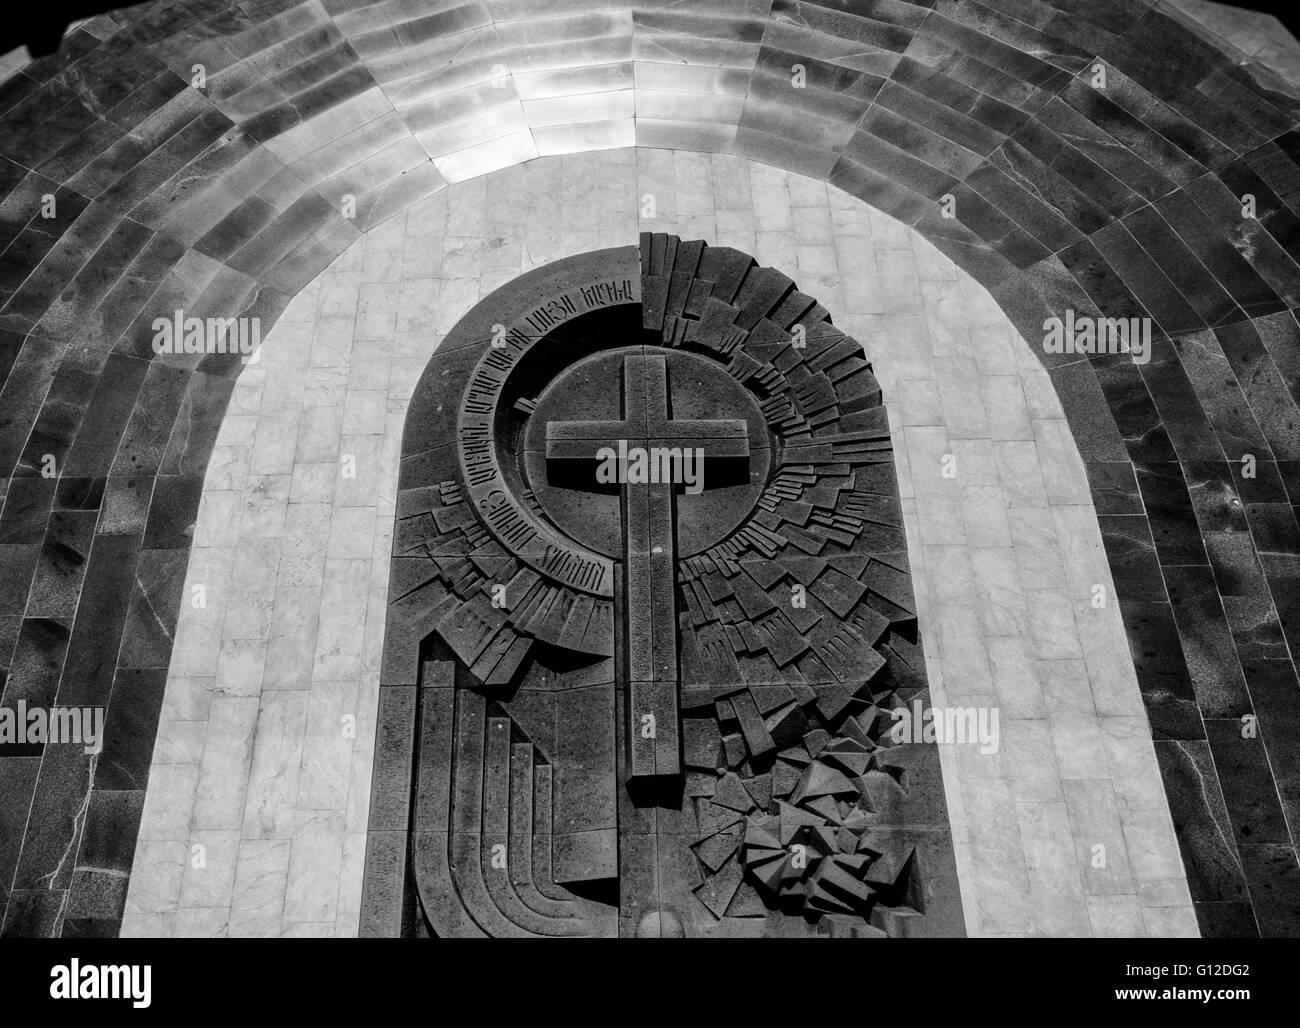 Armenia, Yerevan   Christian Monument - Stock Image